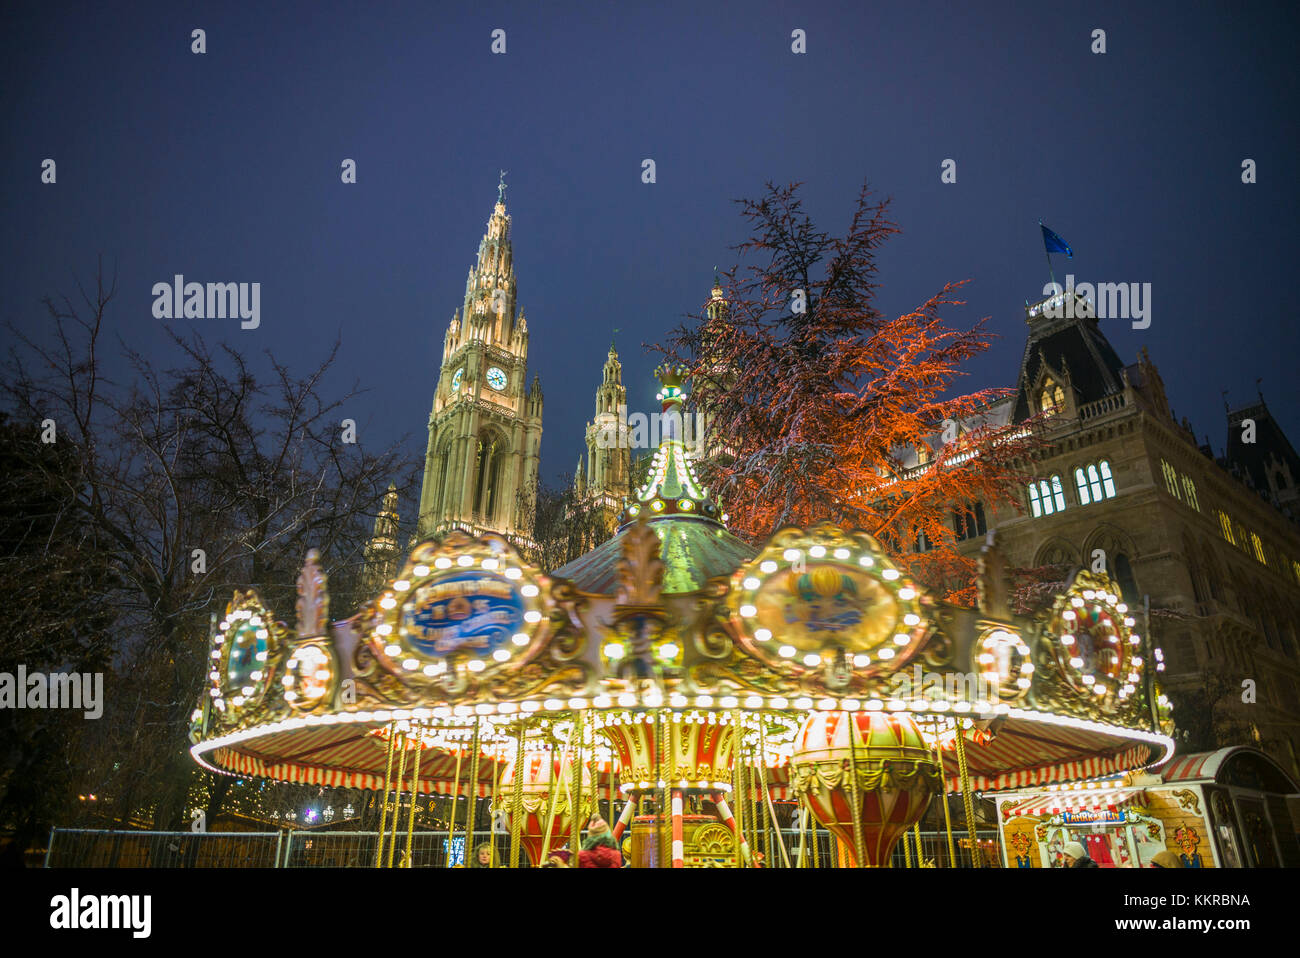 Austria, Vienna, Rathaus, Town Hall, Christmastime - Stock Image